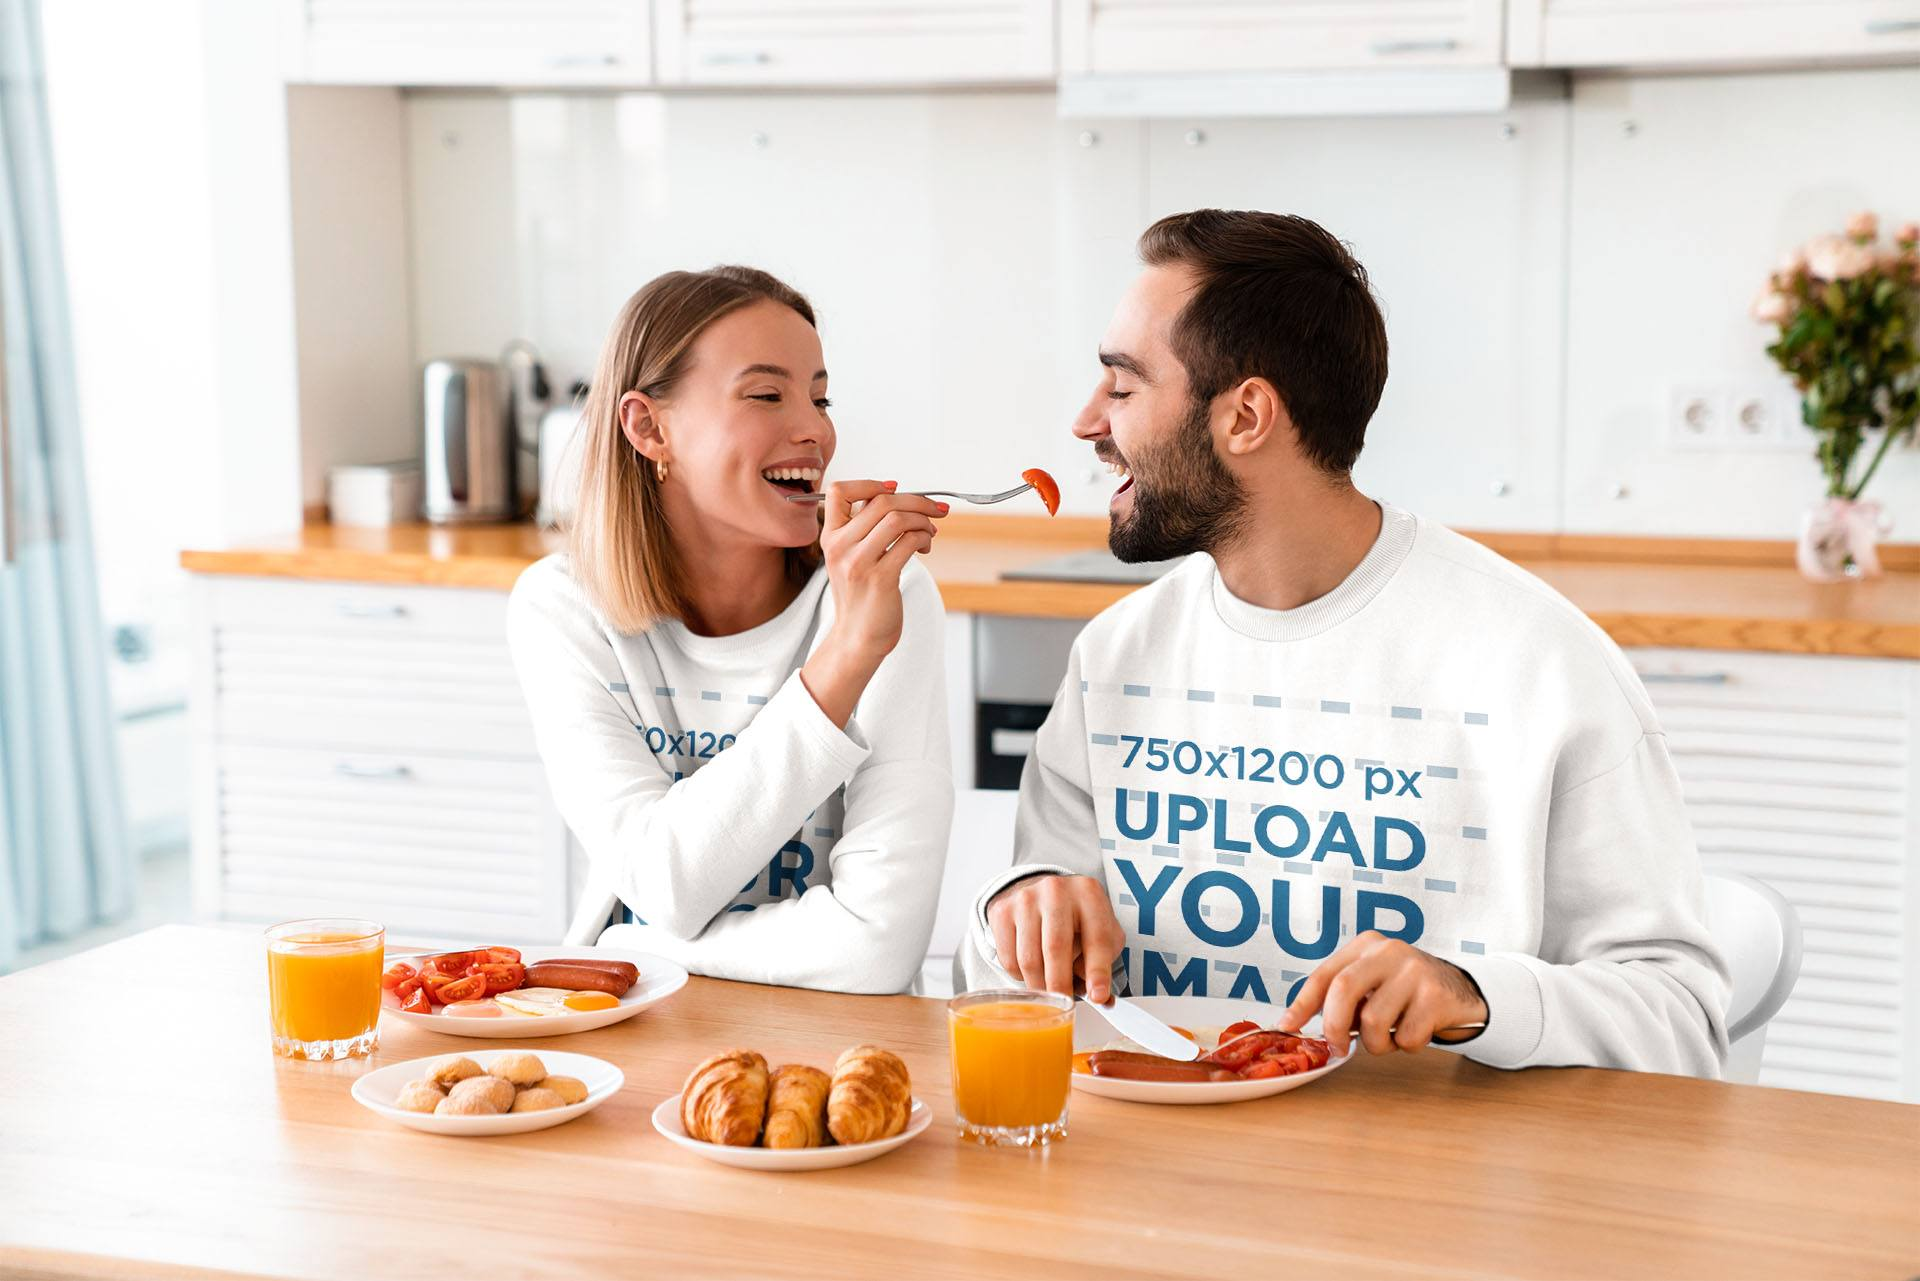 Sweatshirt Mockup of a Couple Having Breakfast Together 40244-rel2